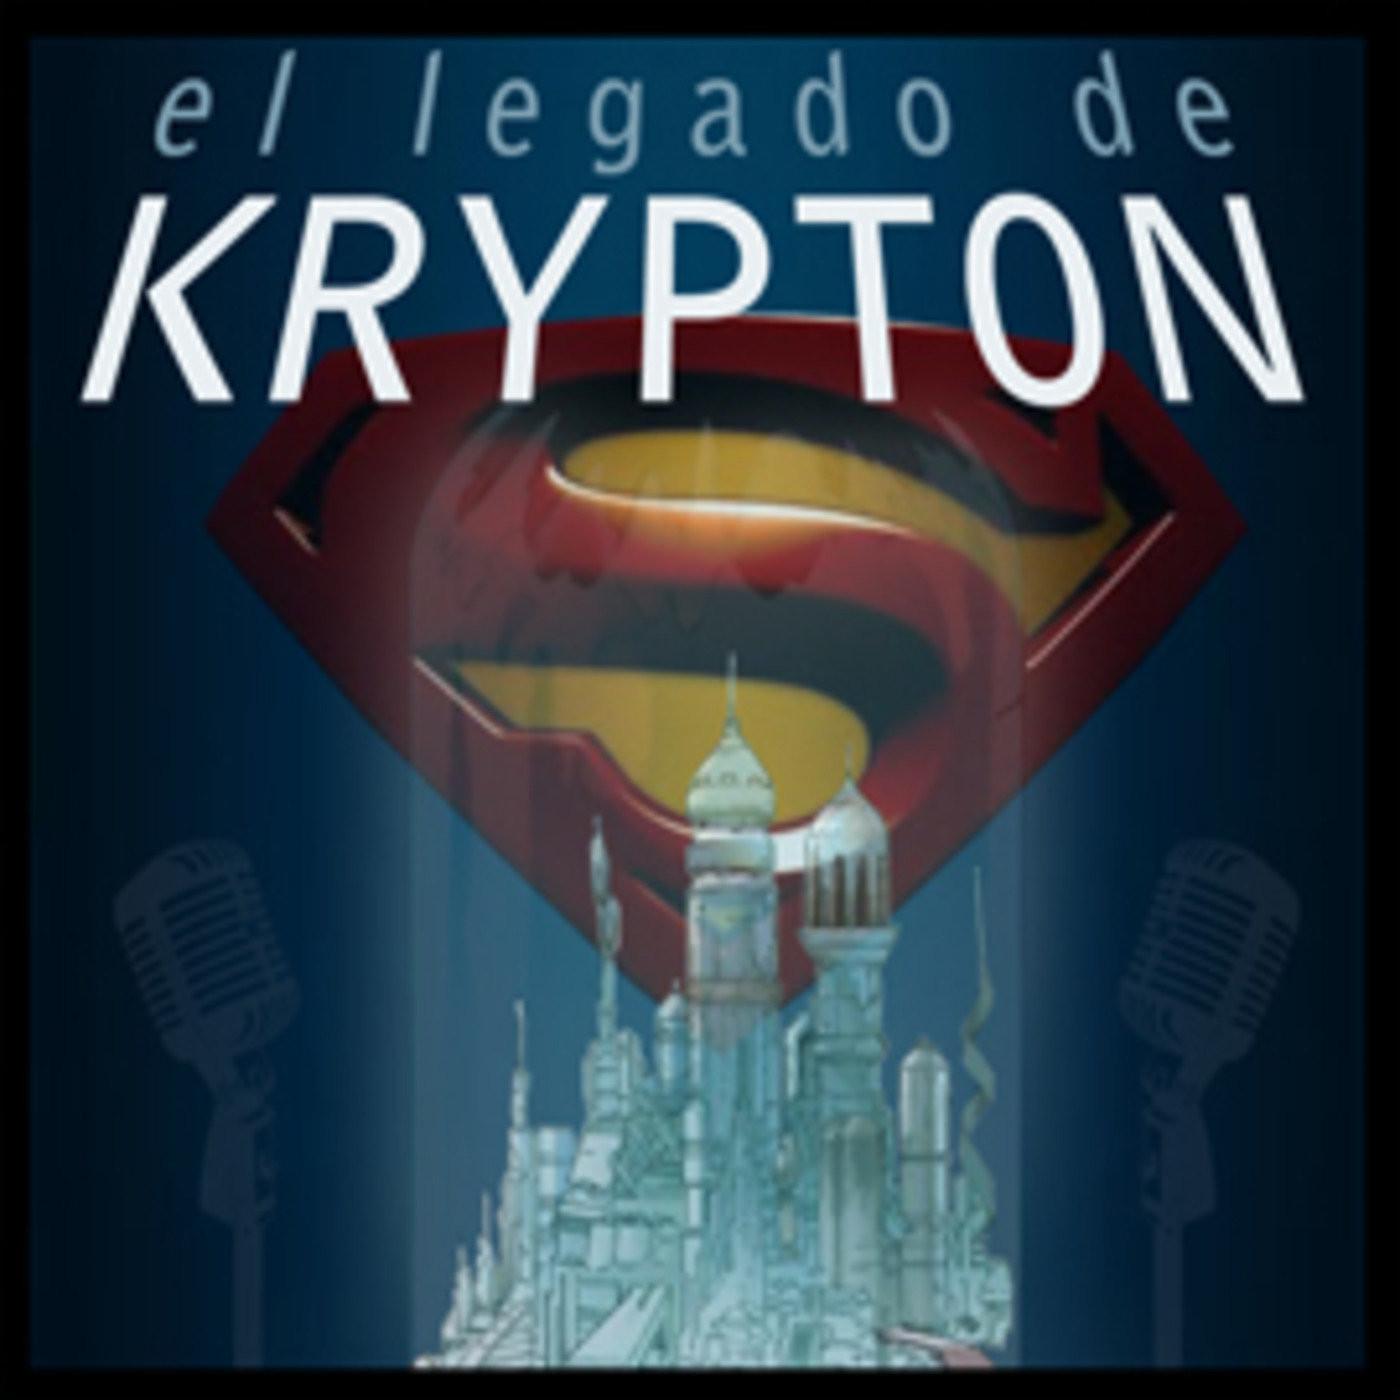 <![CDATA[Podcast El legado de krypton]]>